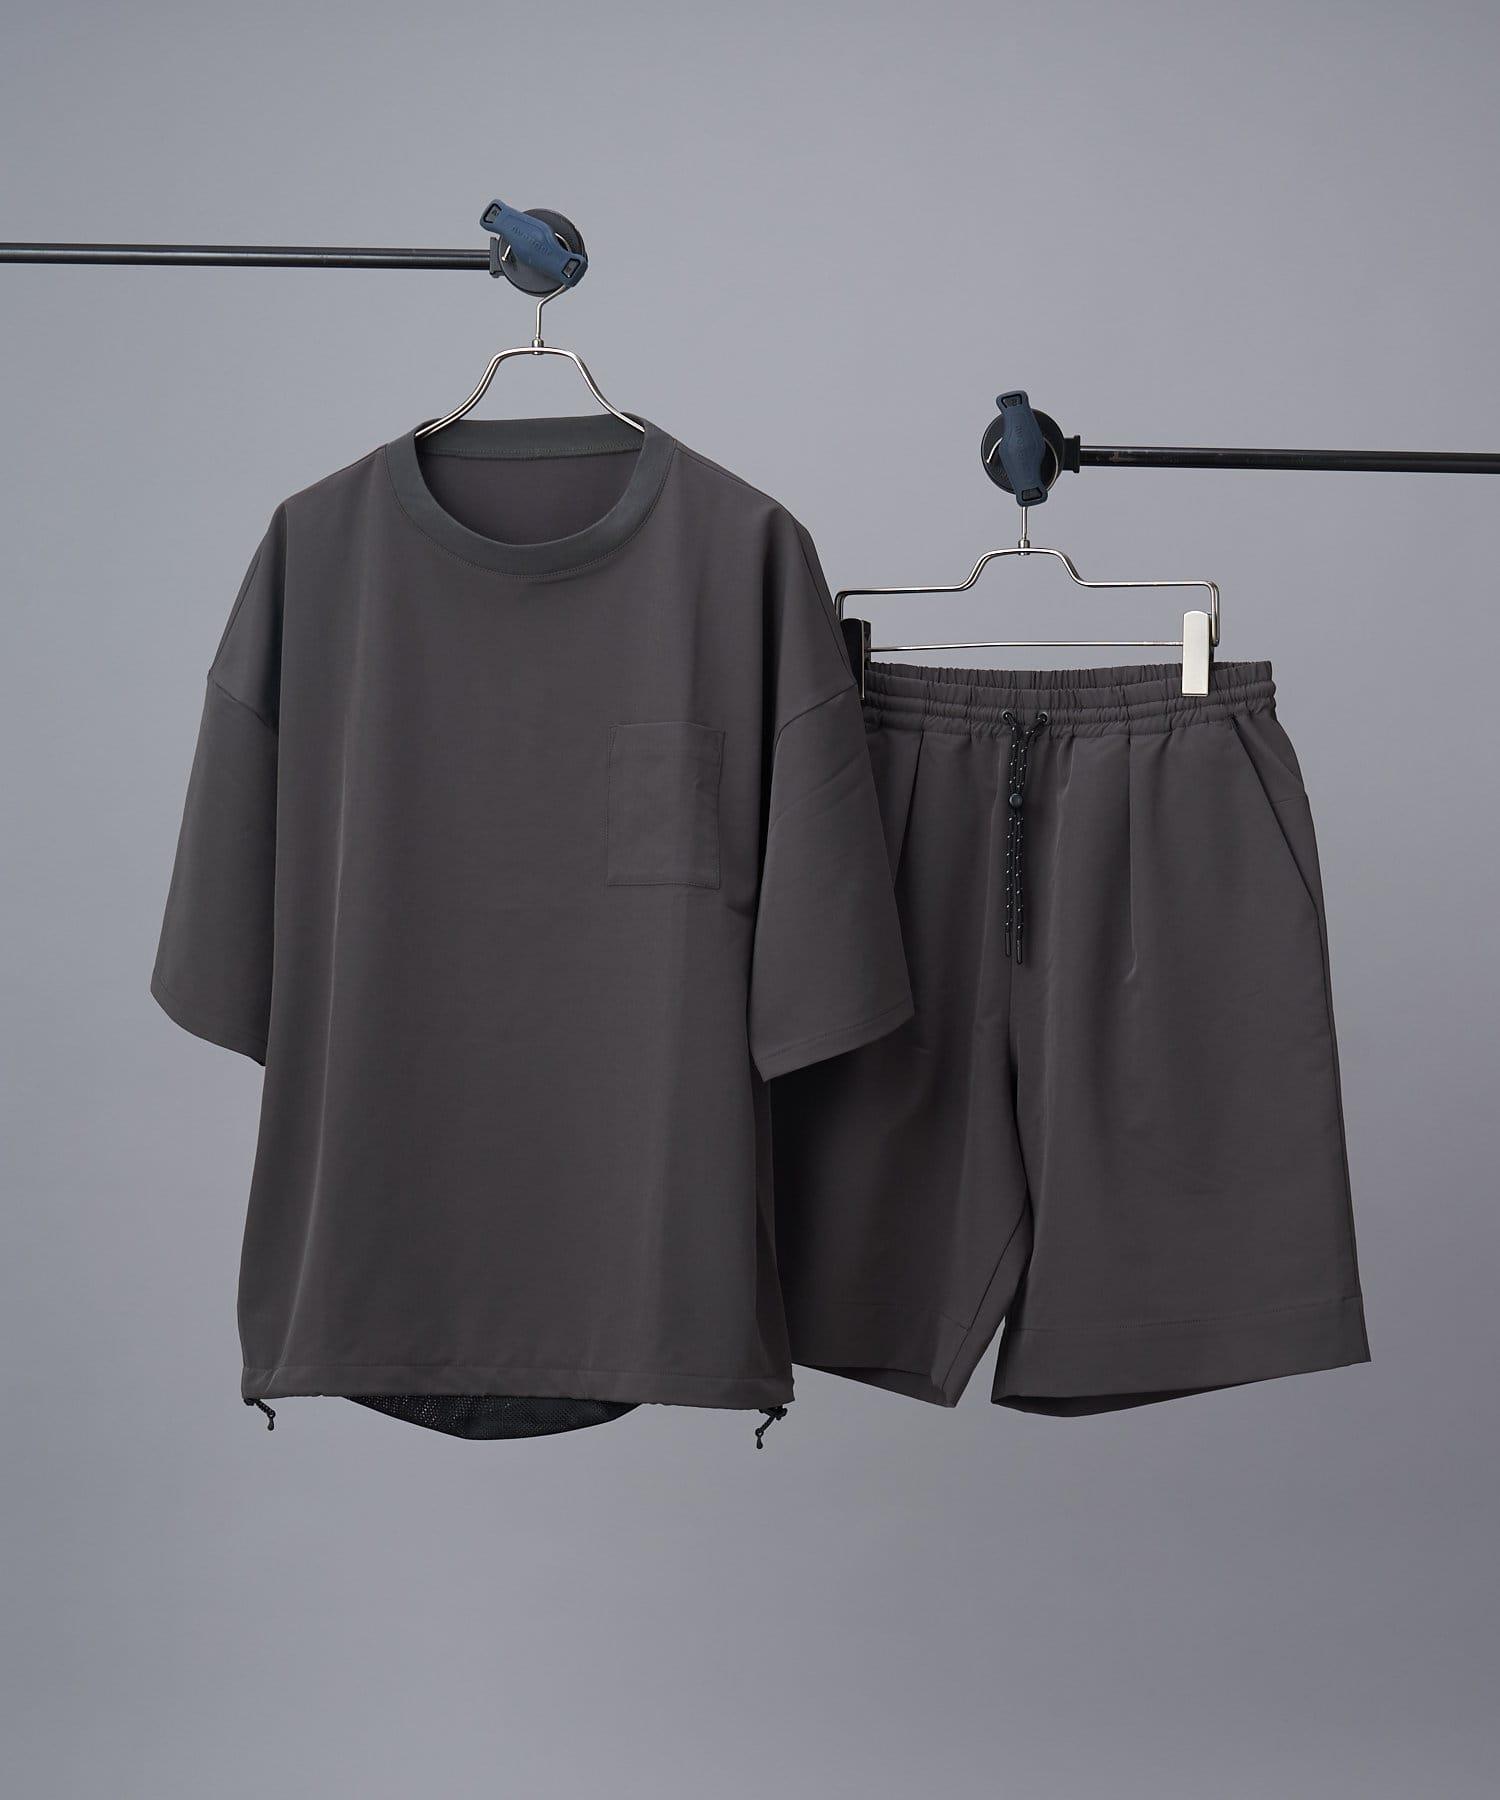 CIAOPANIC(チャオパニック) メンズ 【SHELTECH(R)/シェルテック】ビッグTシャツ+ショーツ/セットアップ グレー